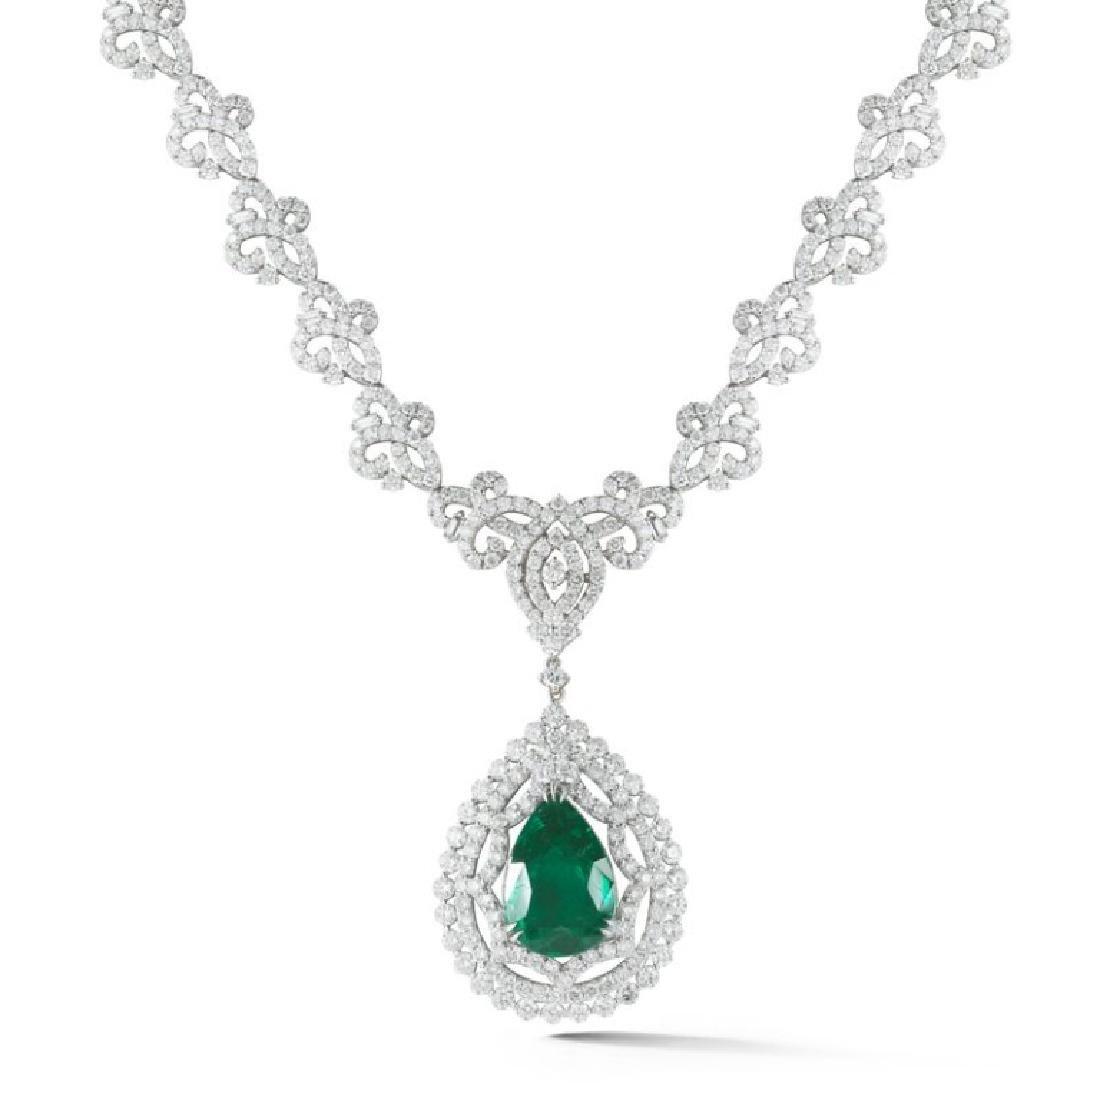 C. Dunaigre, Emerald and Diamond Necklace.